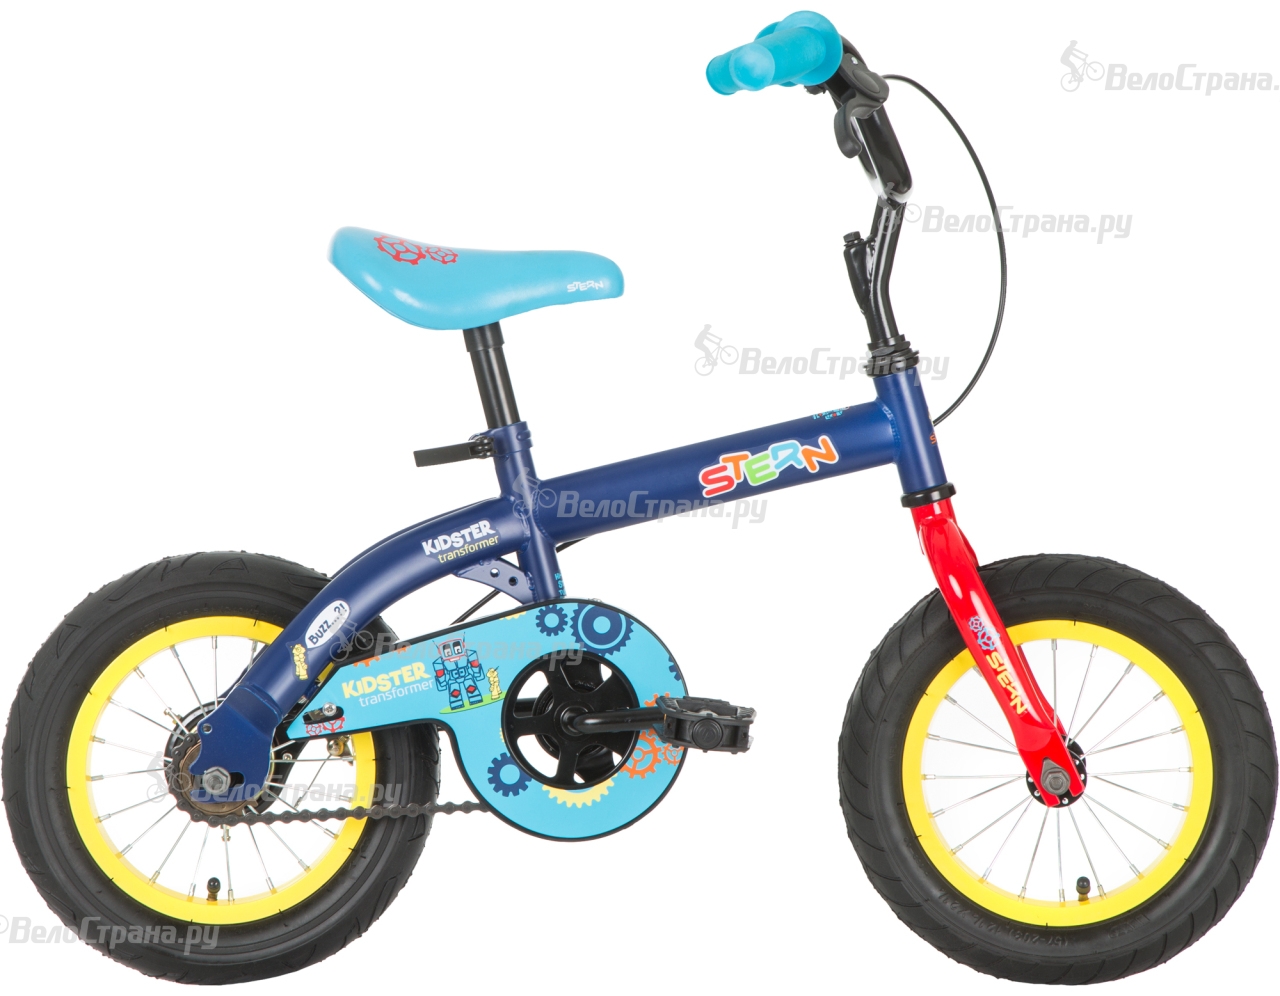 Велосипед Stern Kidster Transformer 12 (2017) stern велосипед складной stern compact 2 0 20